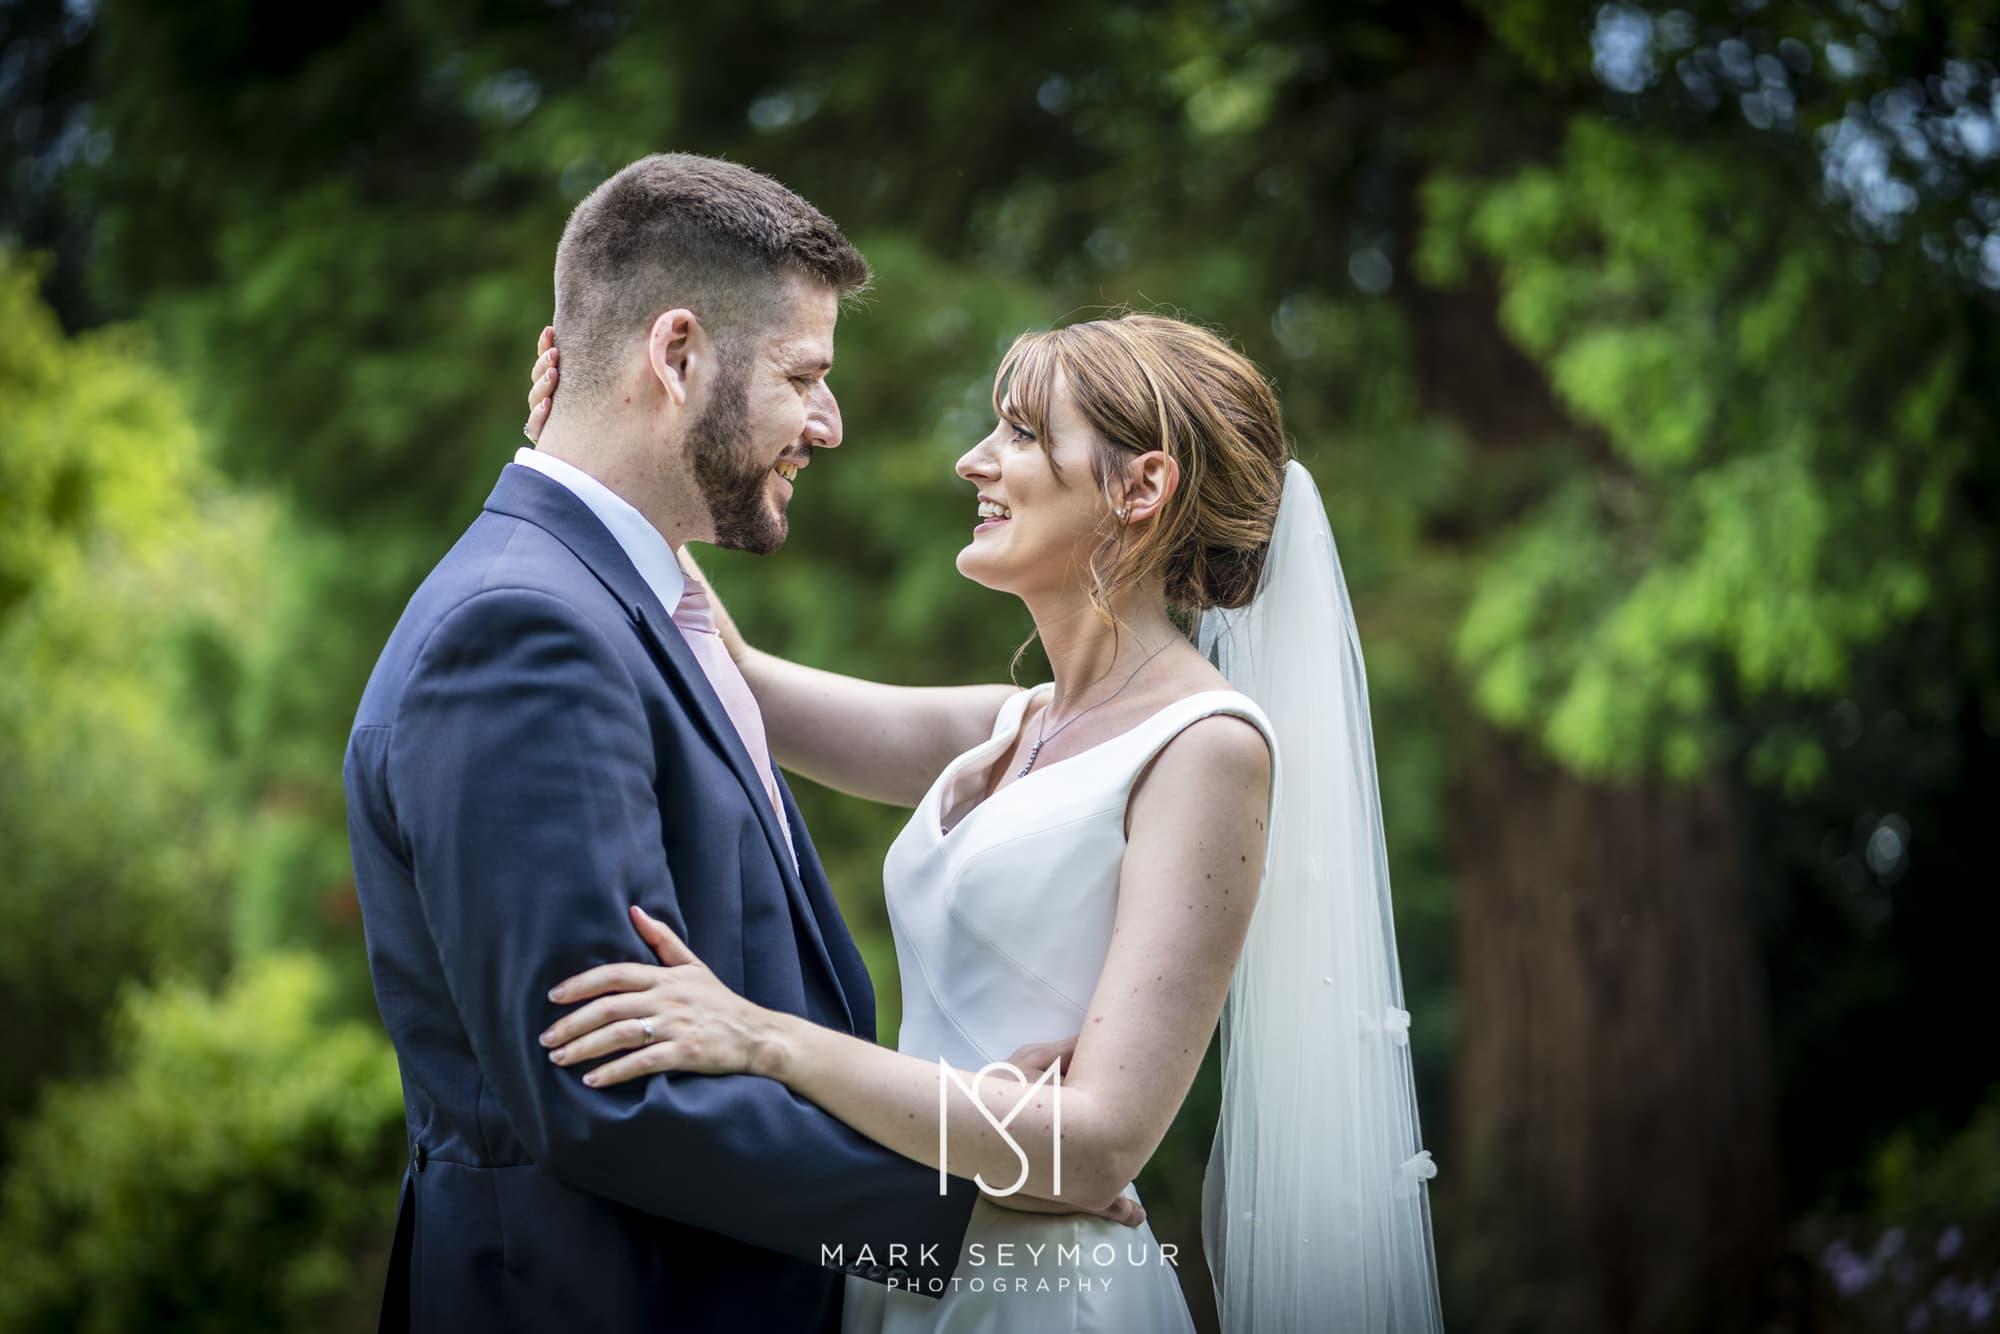 Barnsley House Wedding Photographer - Olivia and James' wedding 19